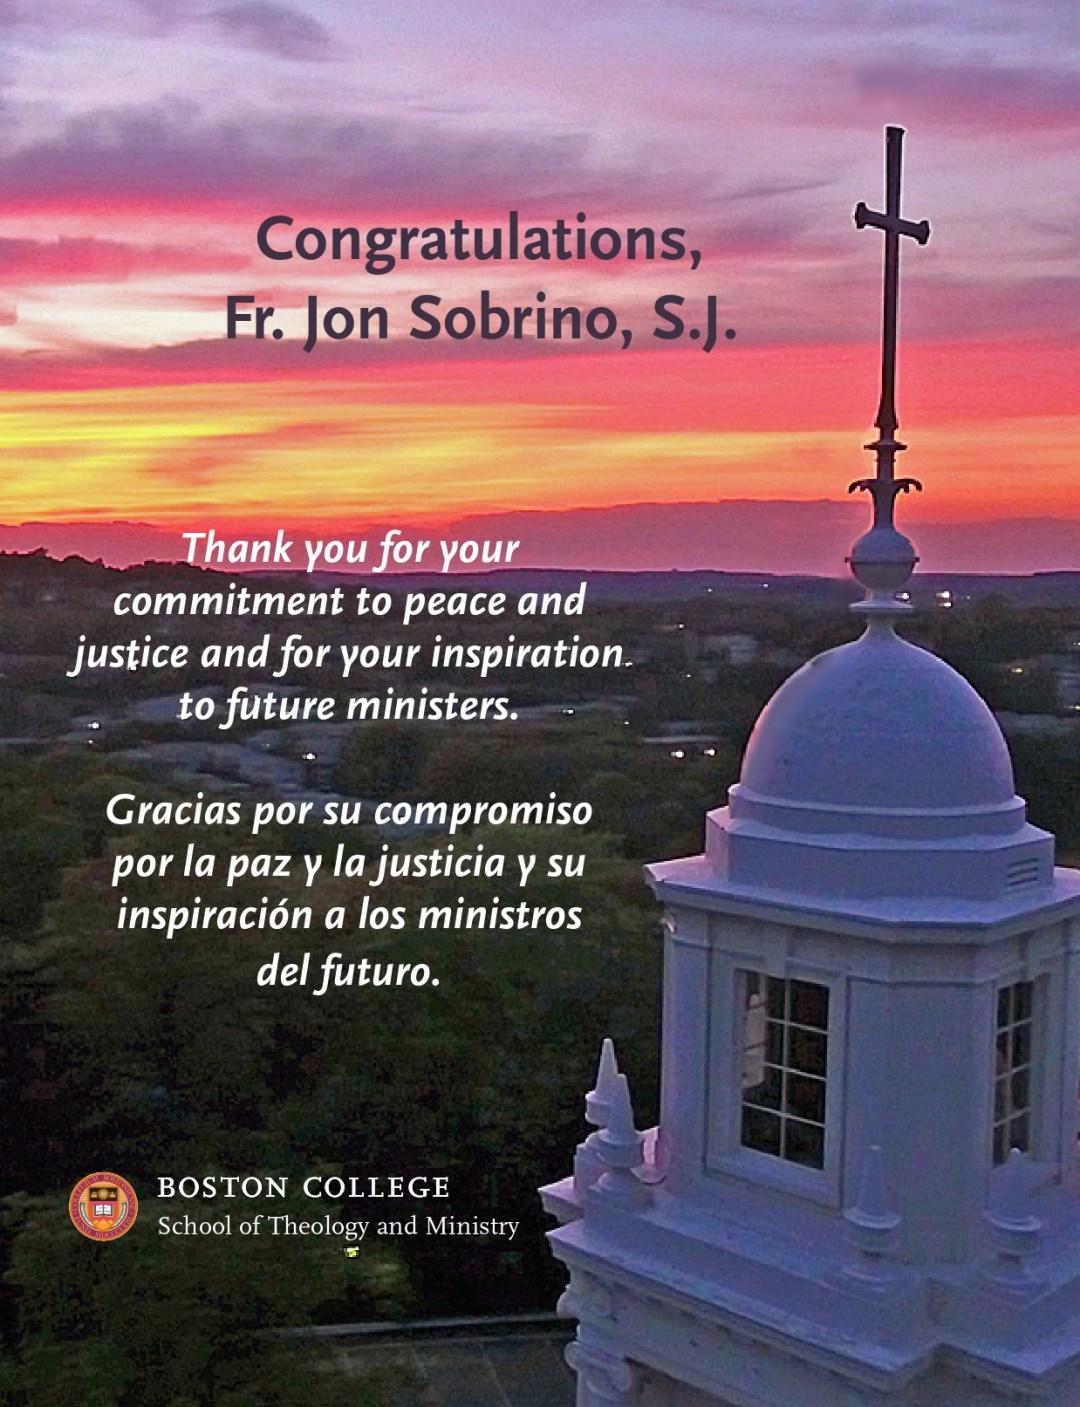 Boston College STM